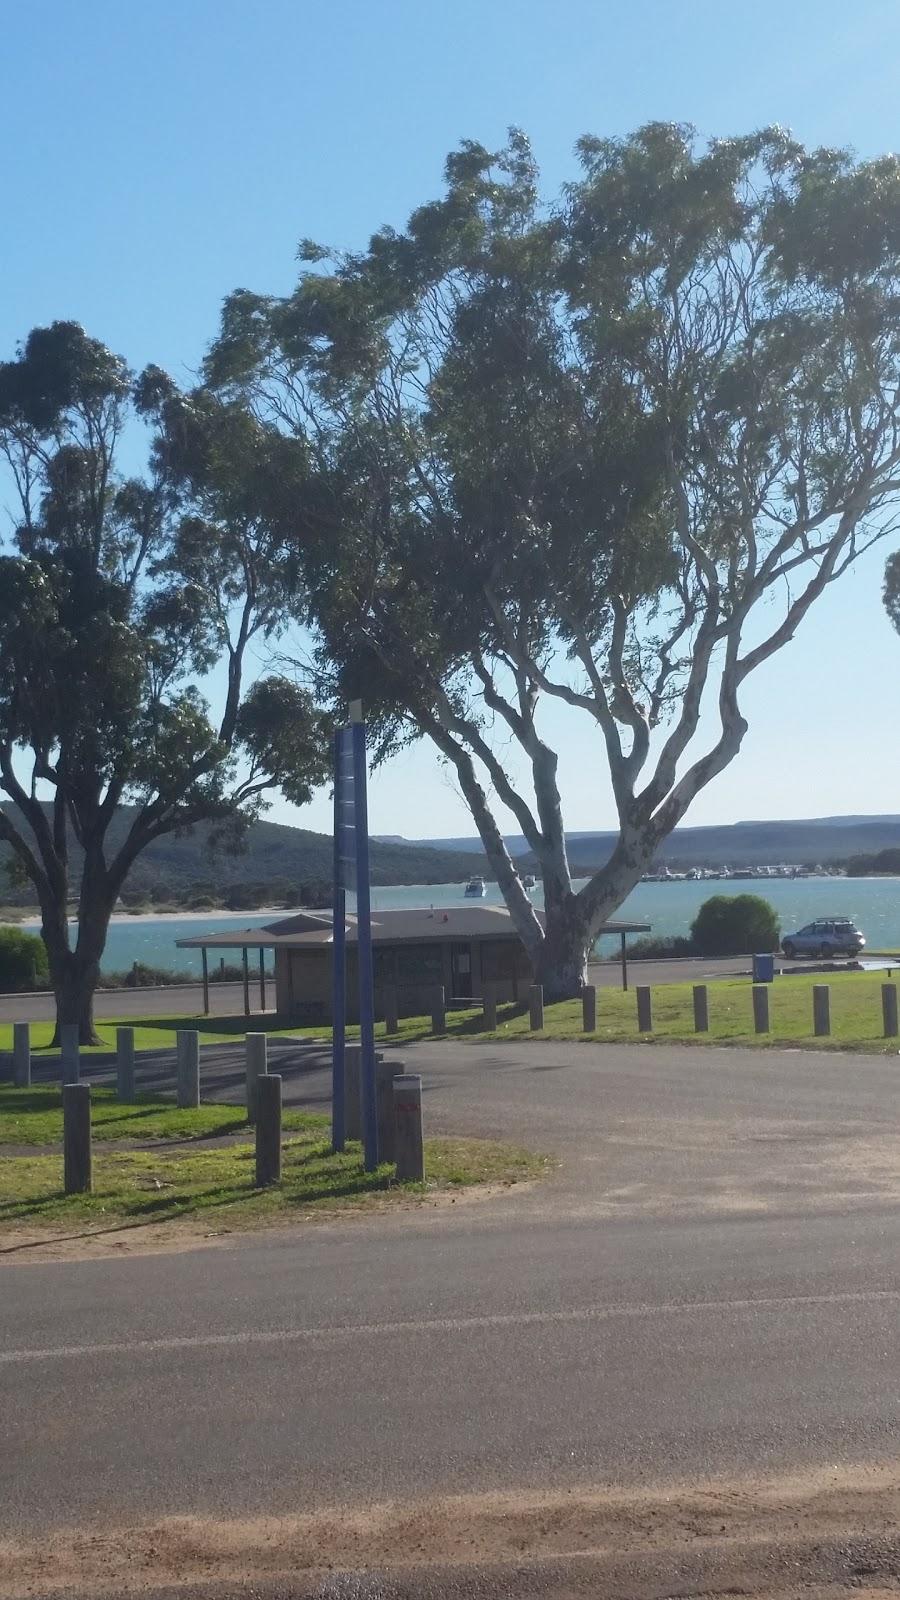 Sunsea Villas | lodging | 38 Grey St, Kalbarri WA 6536, Australia | 0899371187 OR +61 8 9937 1187